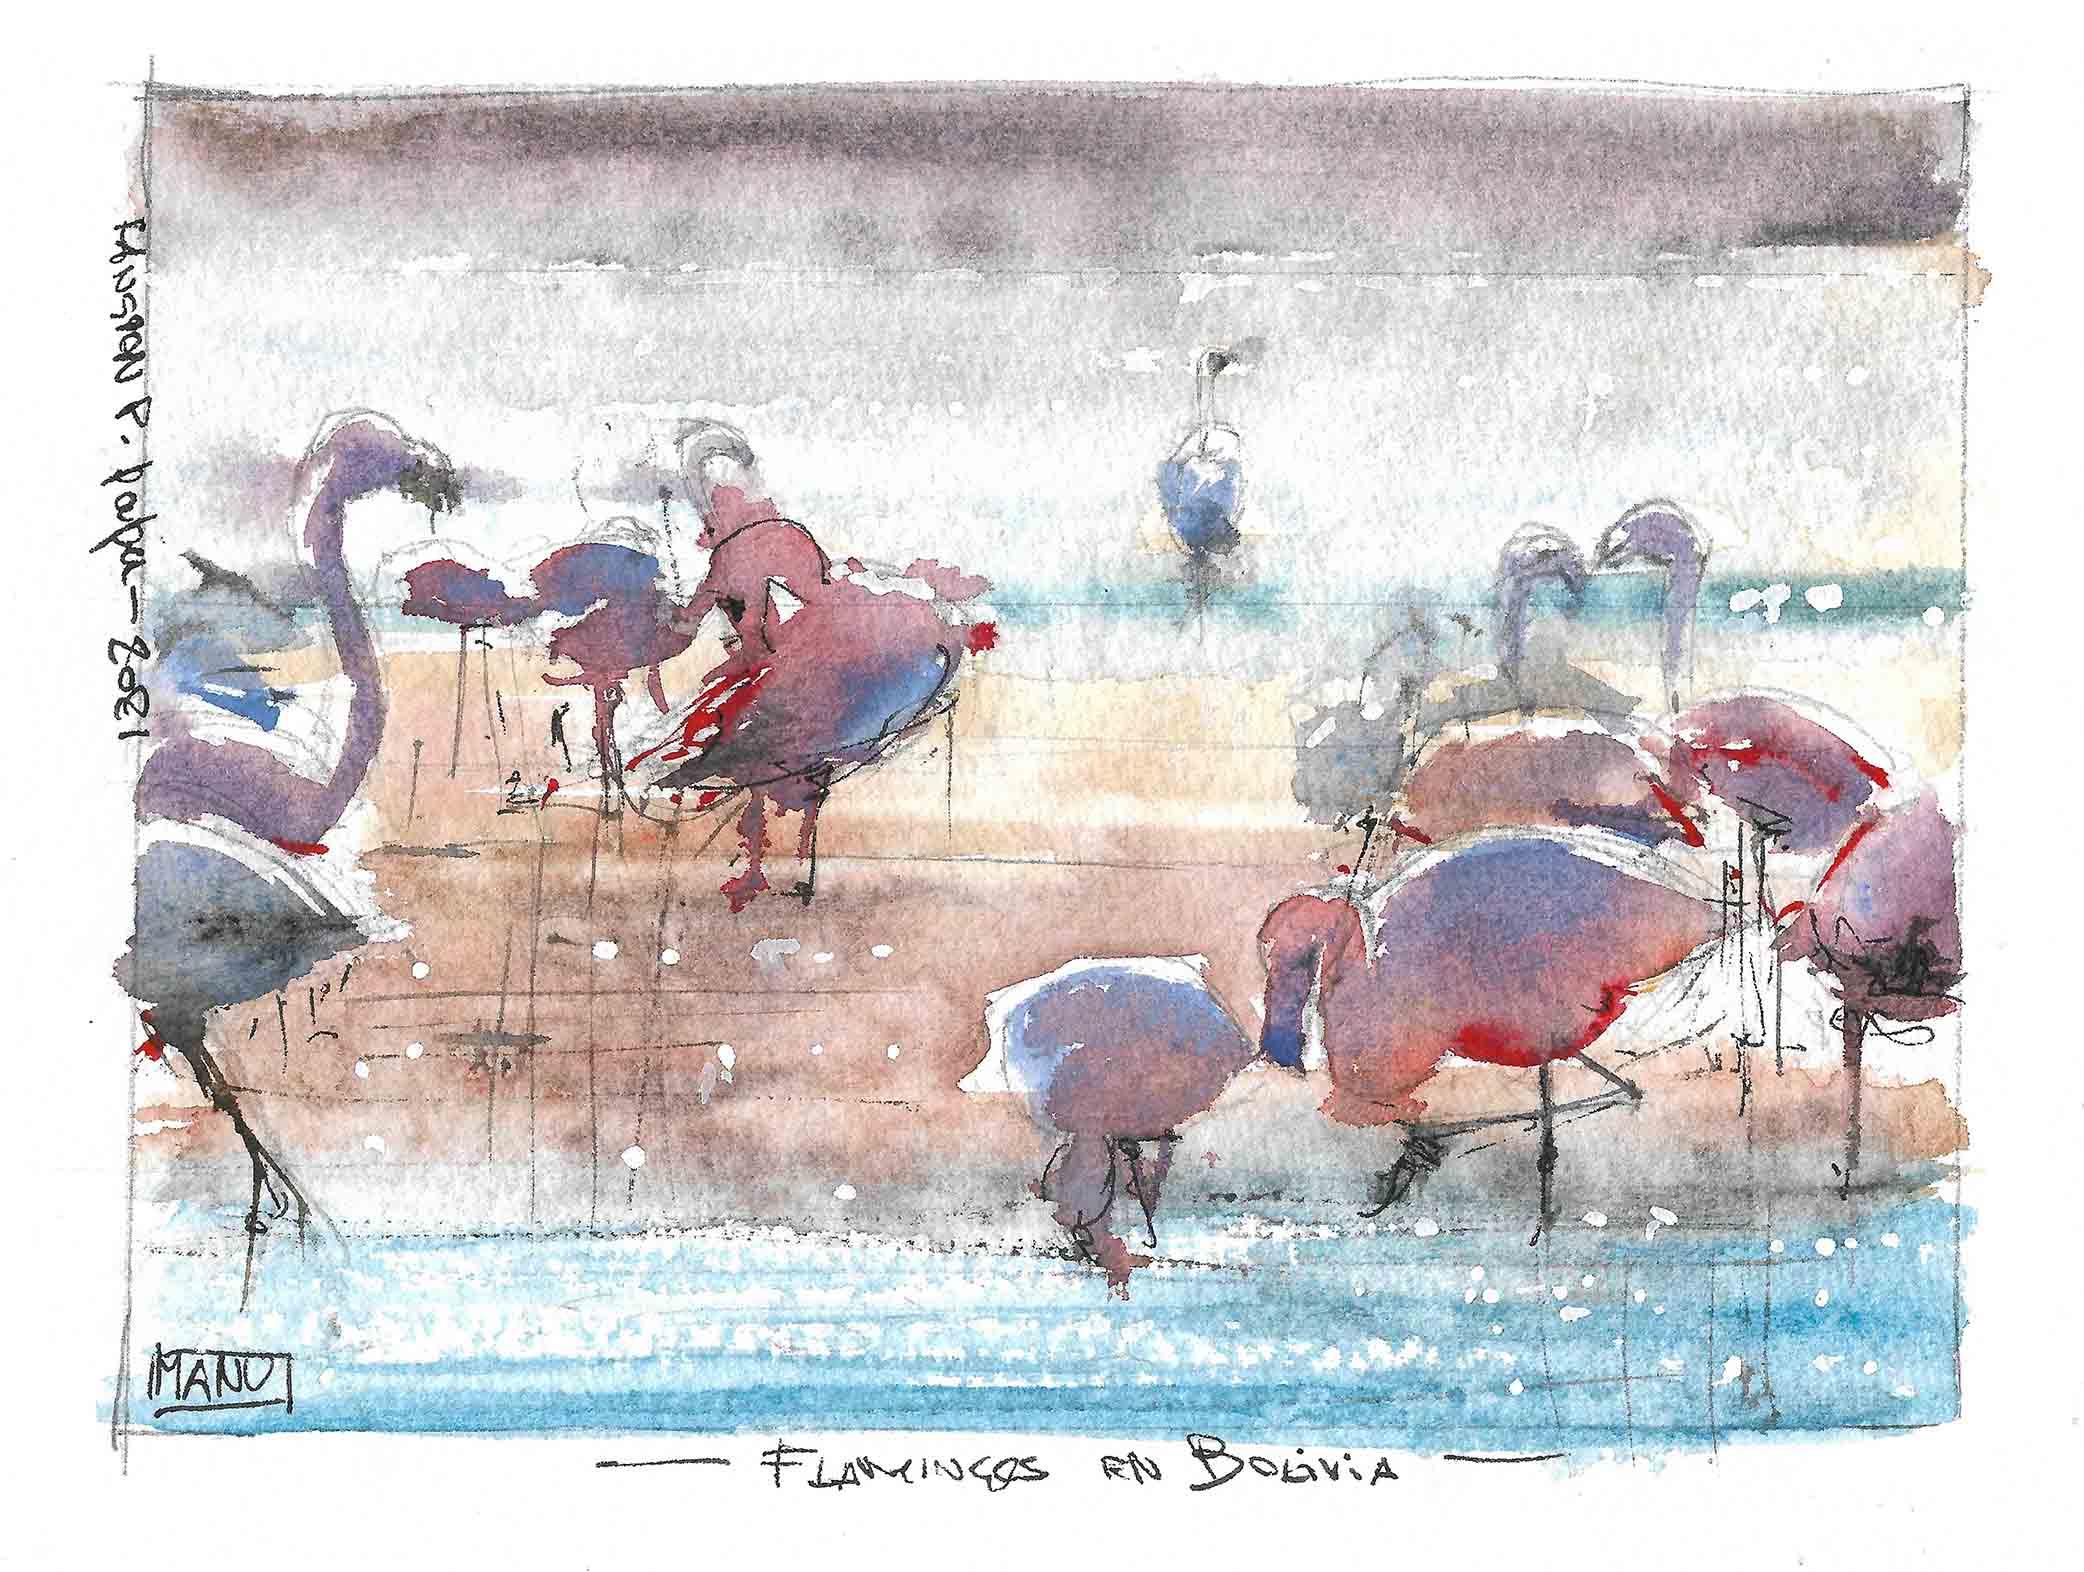 Flamingos Aquarelle Watercolour Emmanuele Cammarano fine artist